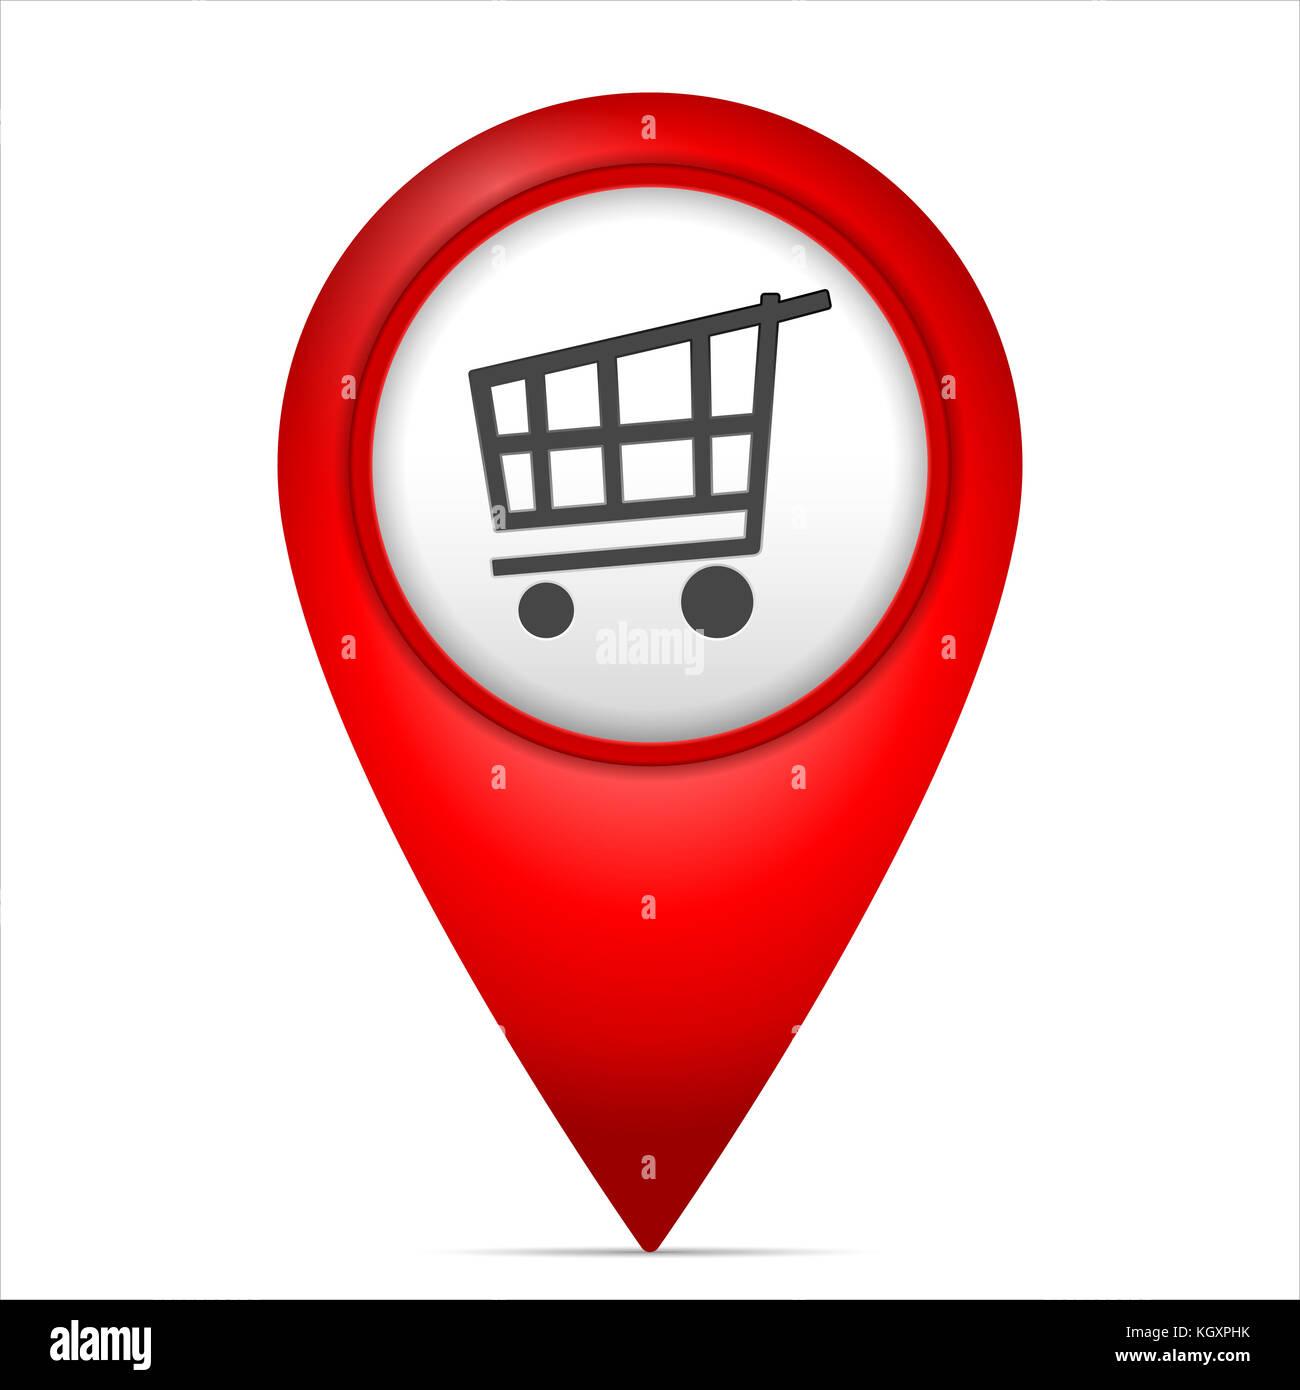 Map marker with shopping cart symbol on a white background ... on mod symbols, power symbols, crane symbols, sport symbols, baltimore symbols, cd symbols, race symbols, state symbols, real symbols, cook symbols,